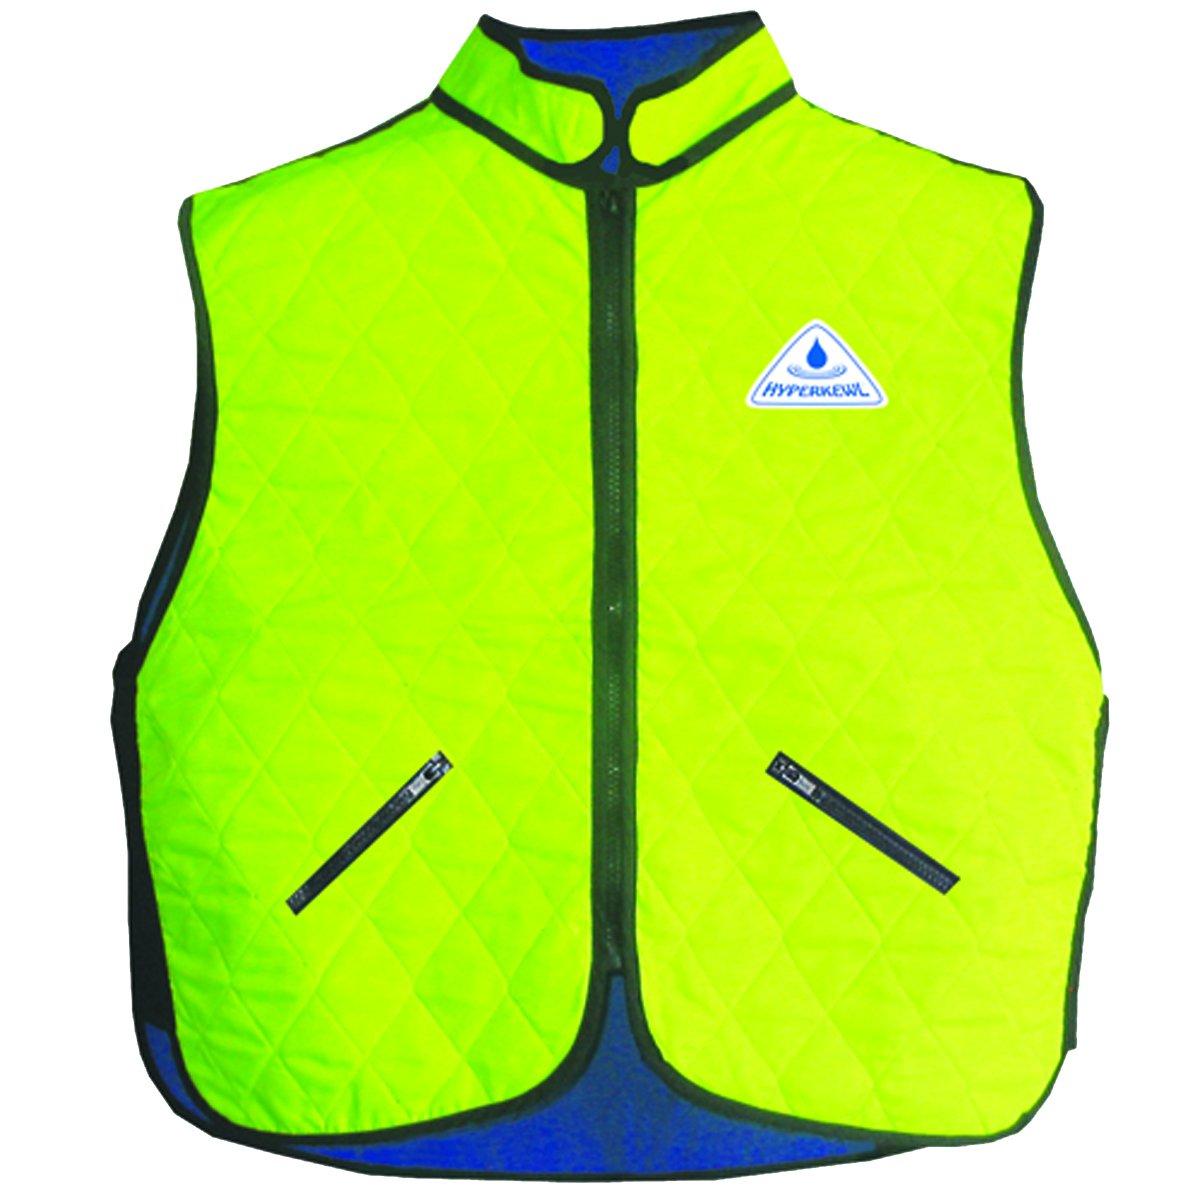 TECHNICHE INT'L HYPERKEWL EVAPORATIVE Cooling Deluxe Sport Vest - HI VIZ Lime